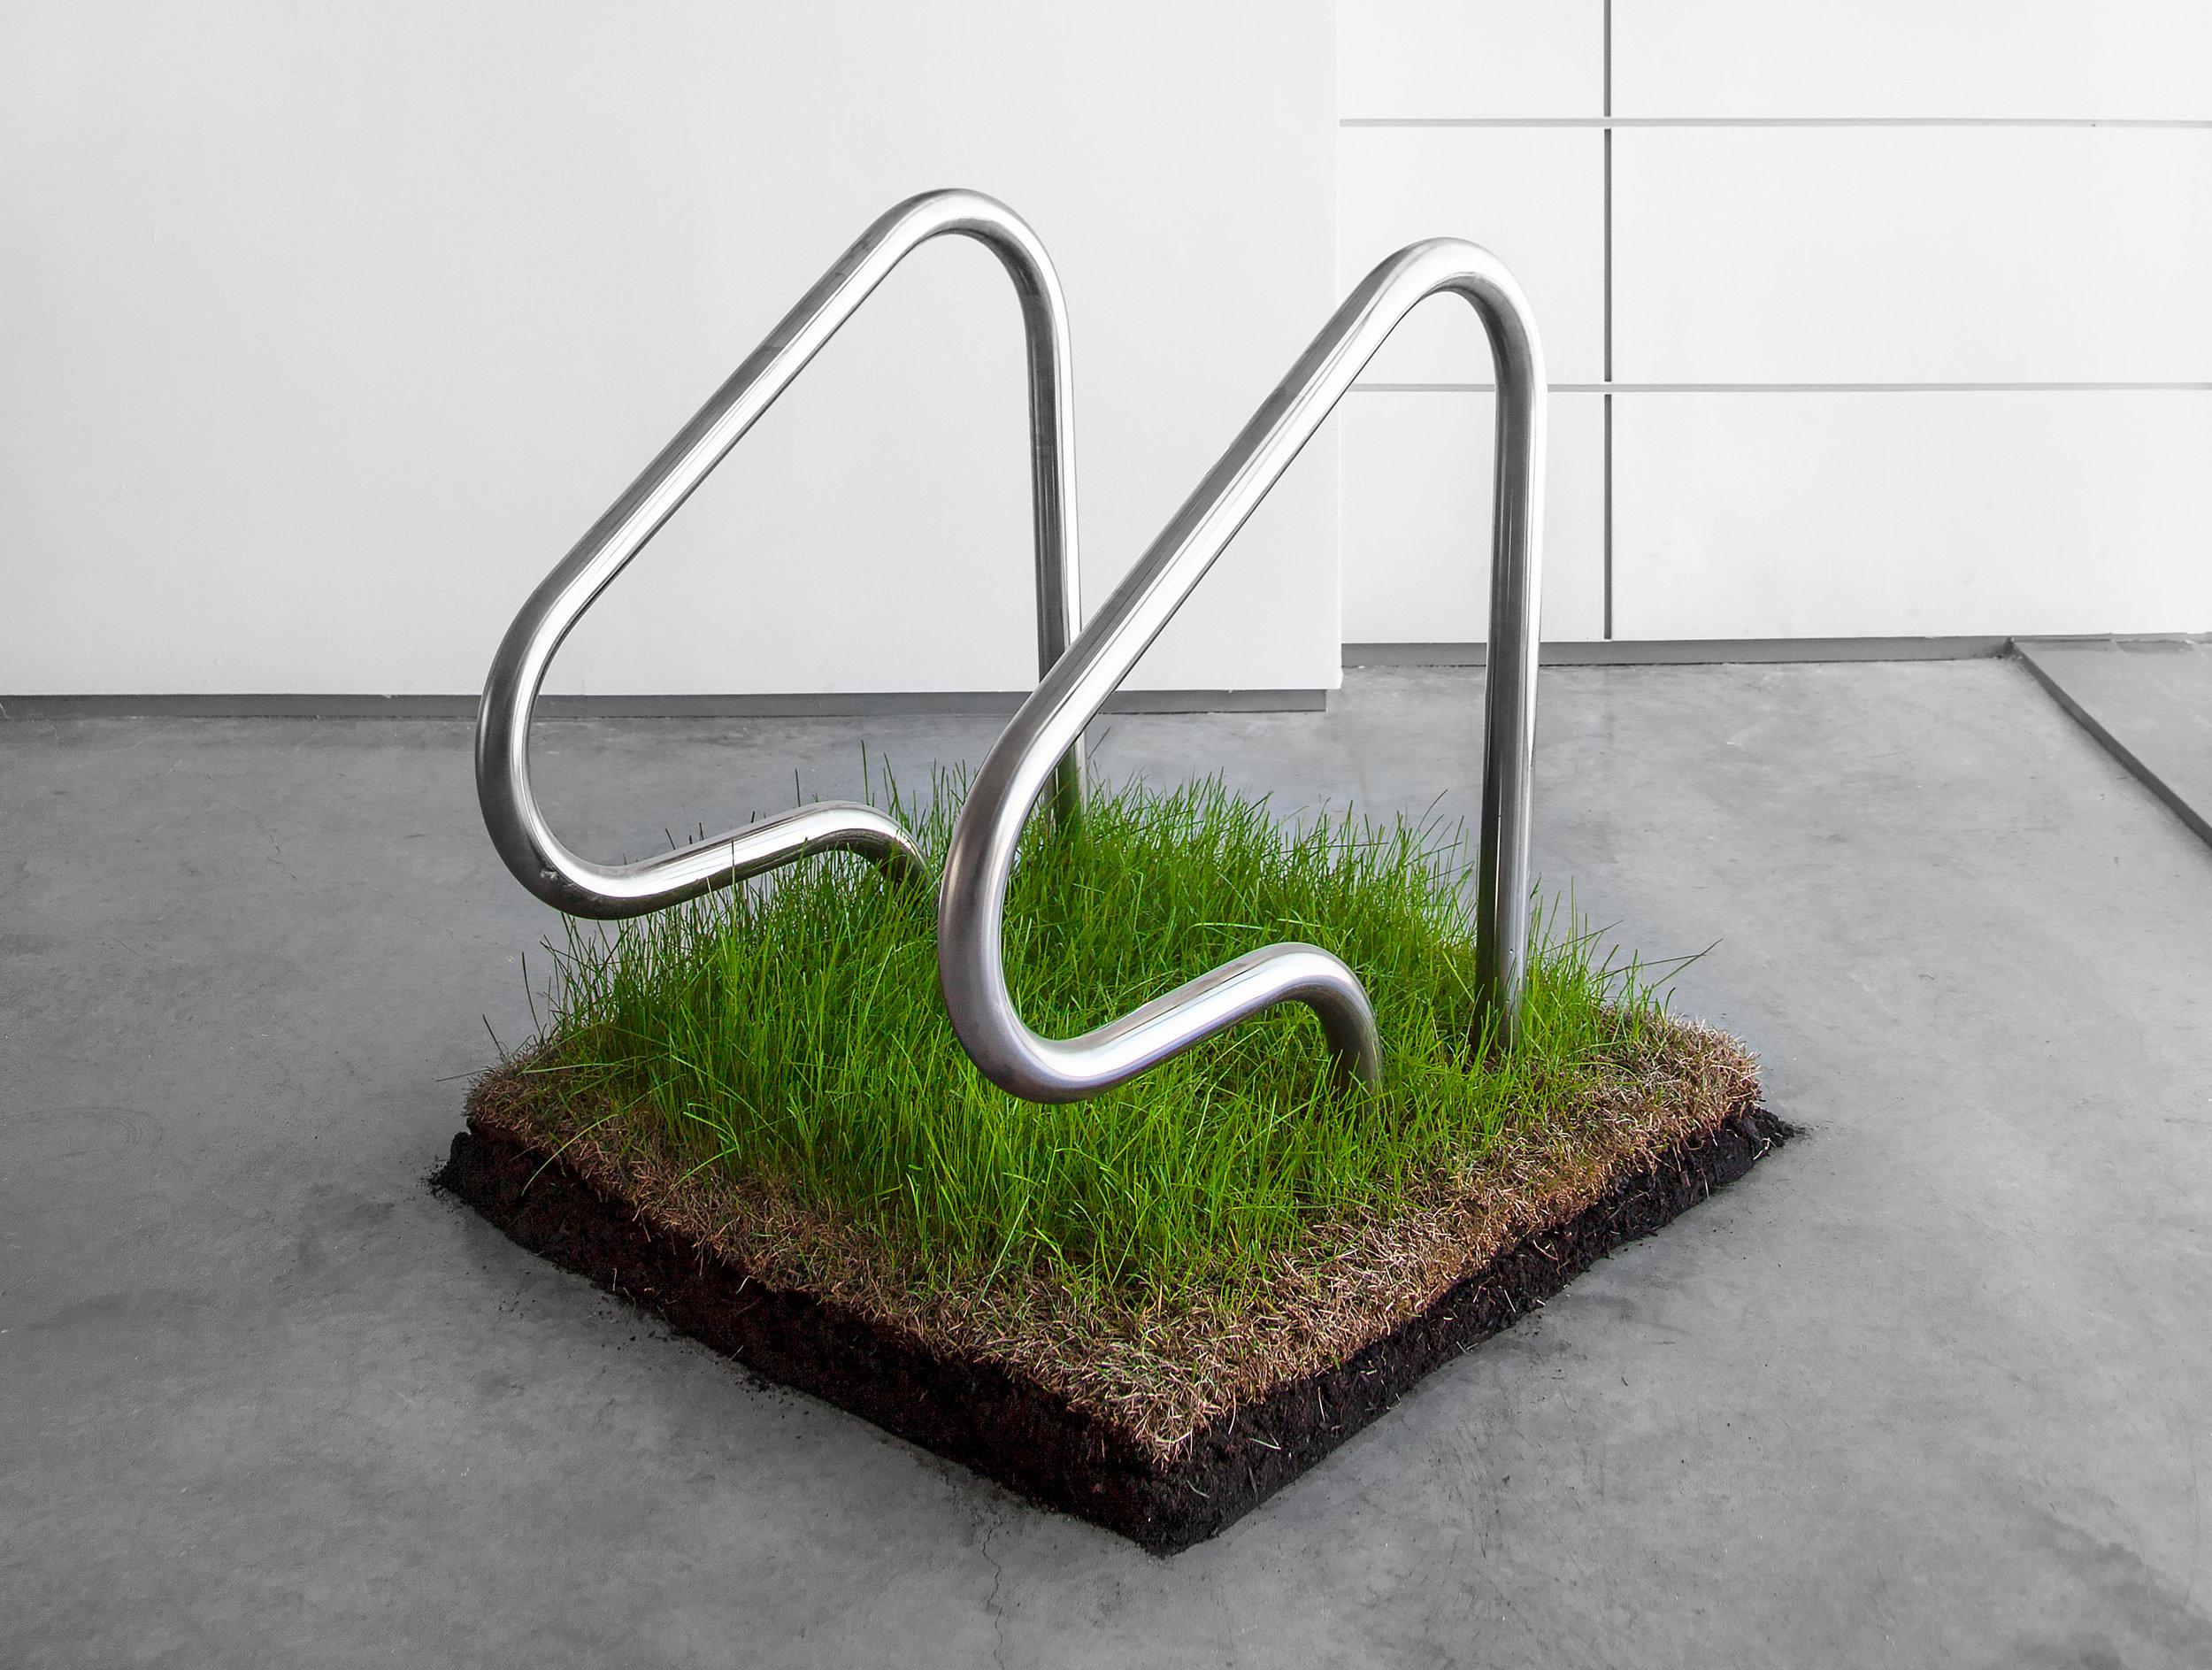 "Lawn Rails  ,  2014, stainless steel, grass, soil, wood base, 36""x 36"" x 36"" (91.4 cm x 91.4 cm x 91.4 cm)"